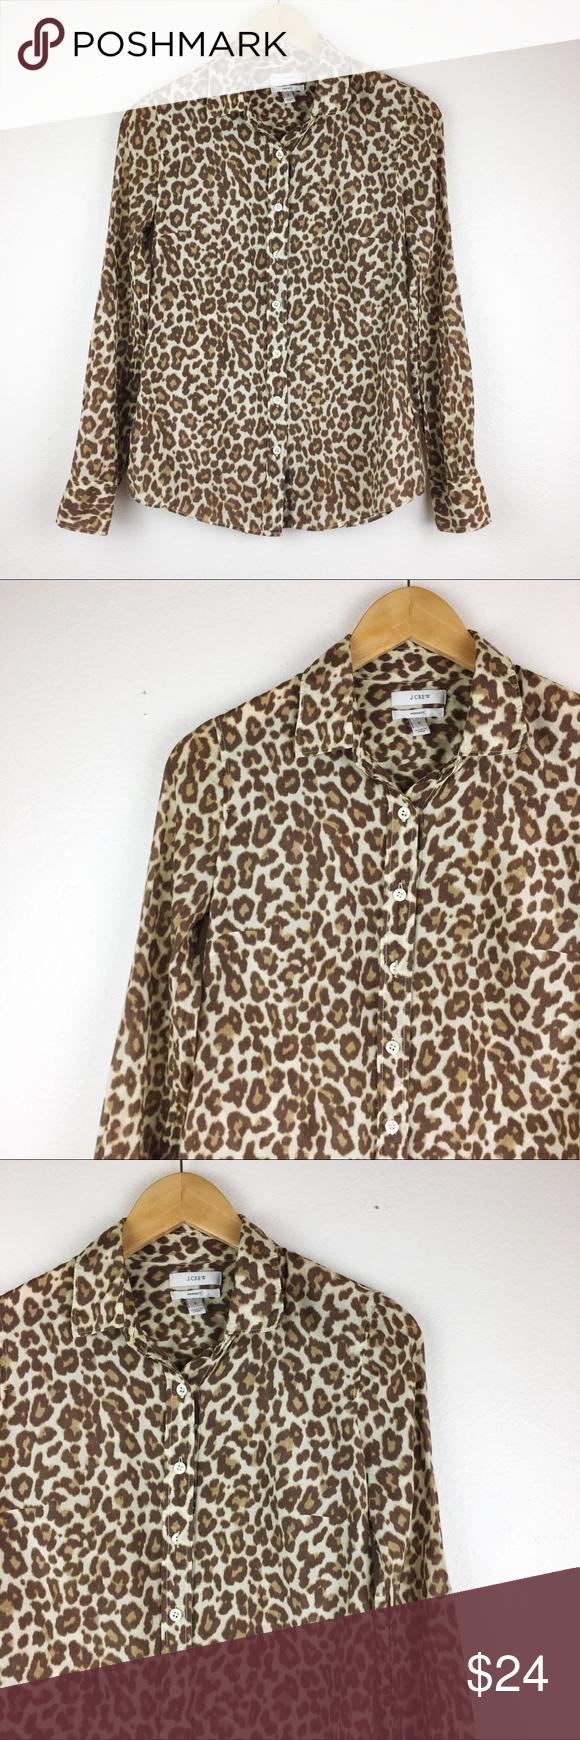 e8325ab6c3ca10 J Crew Leopard Print Shirt Silk Blend Size 0 J Crew Leopard Print Shirt  Size